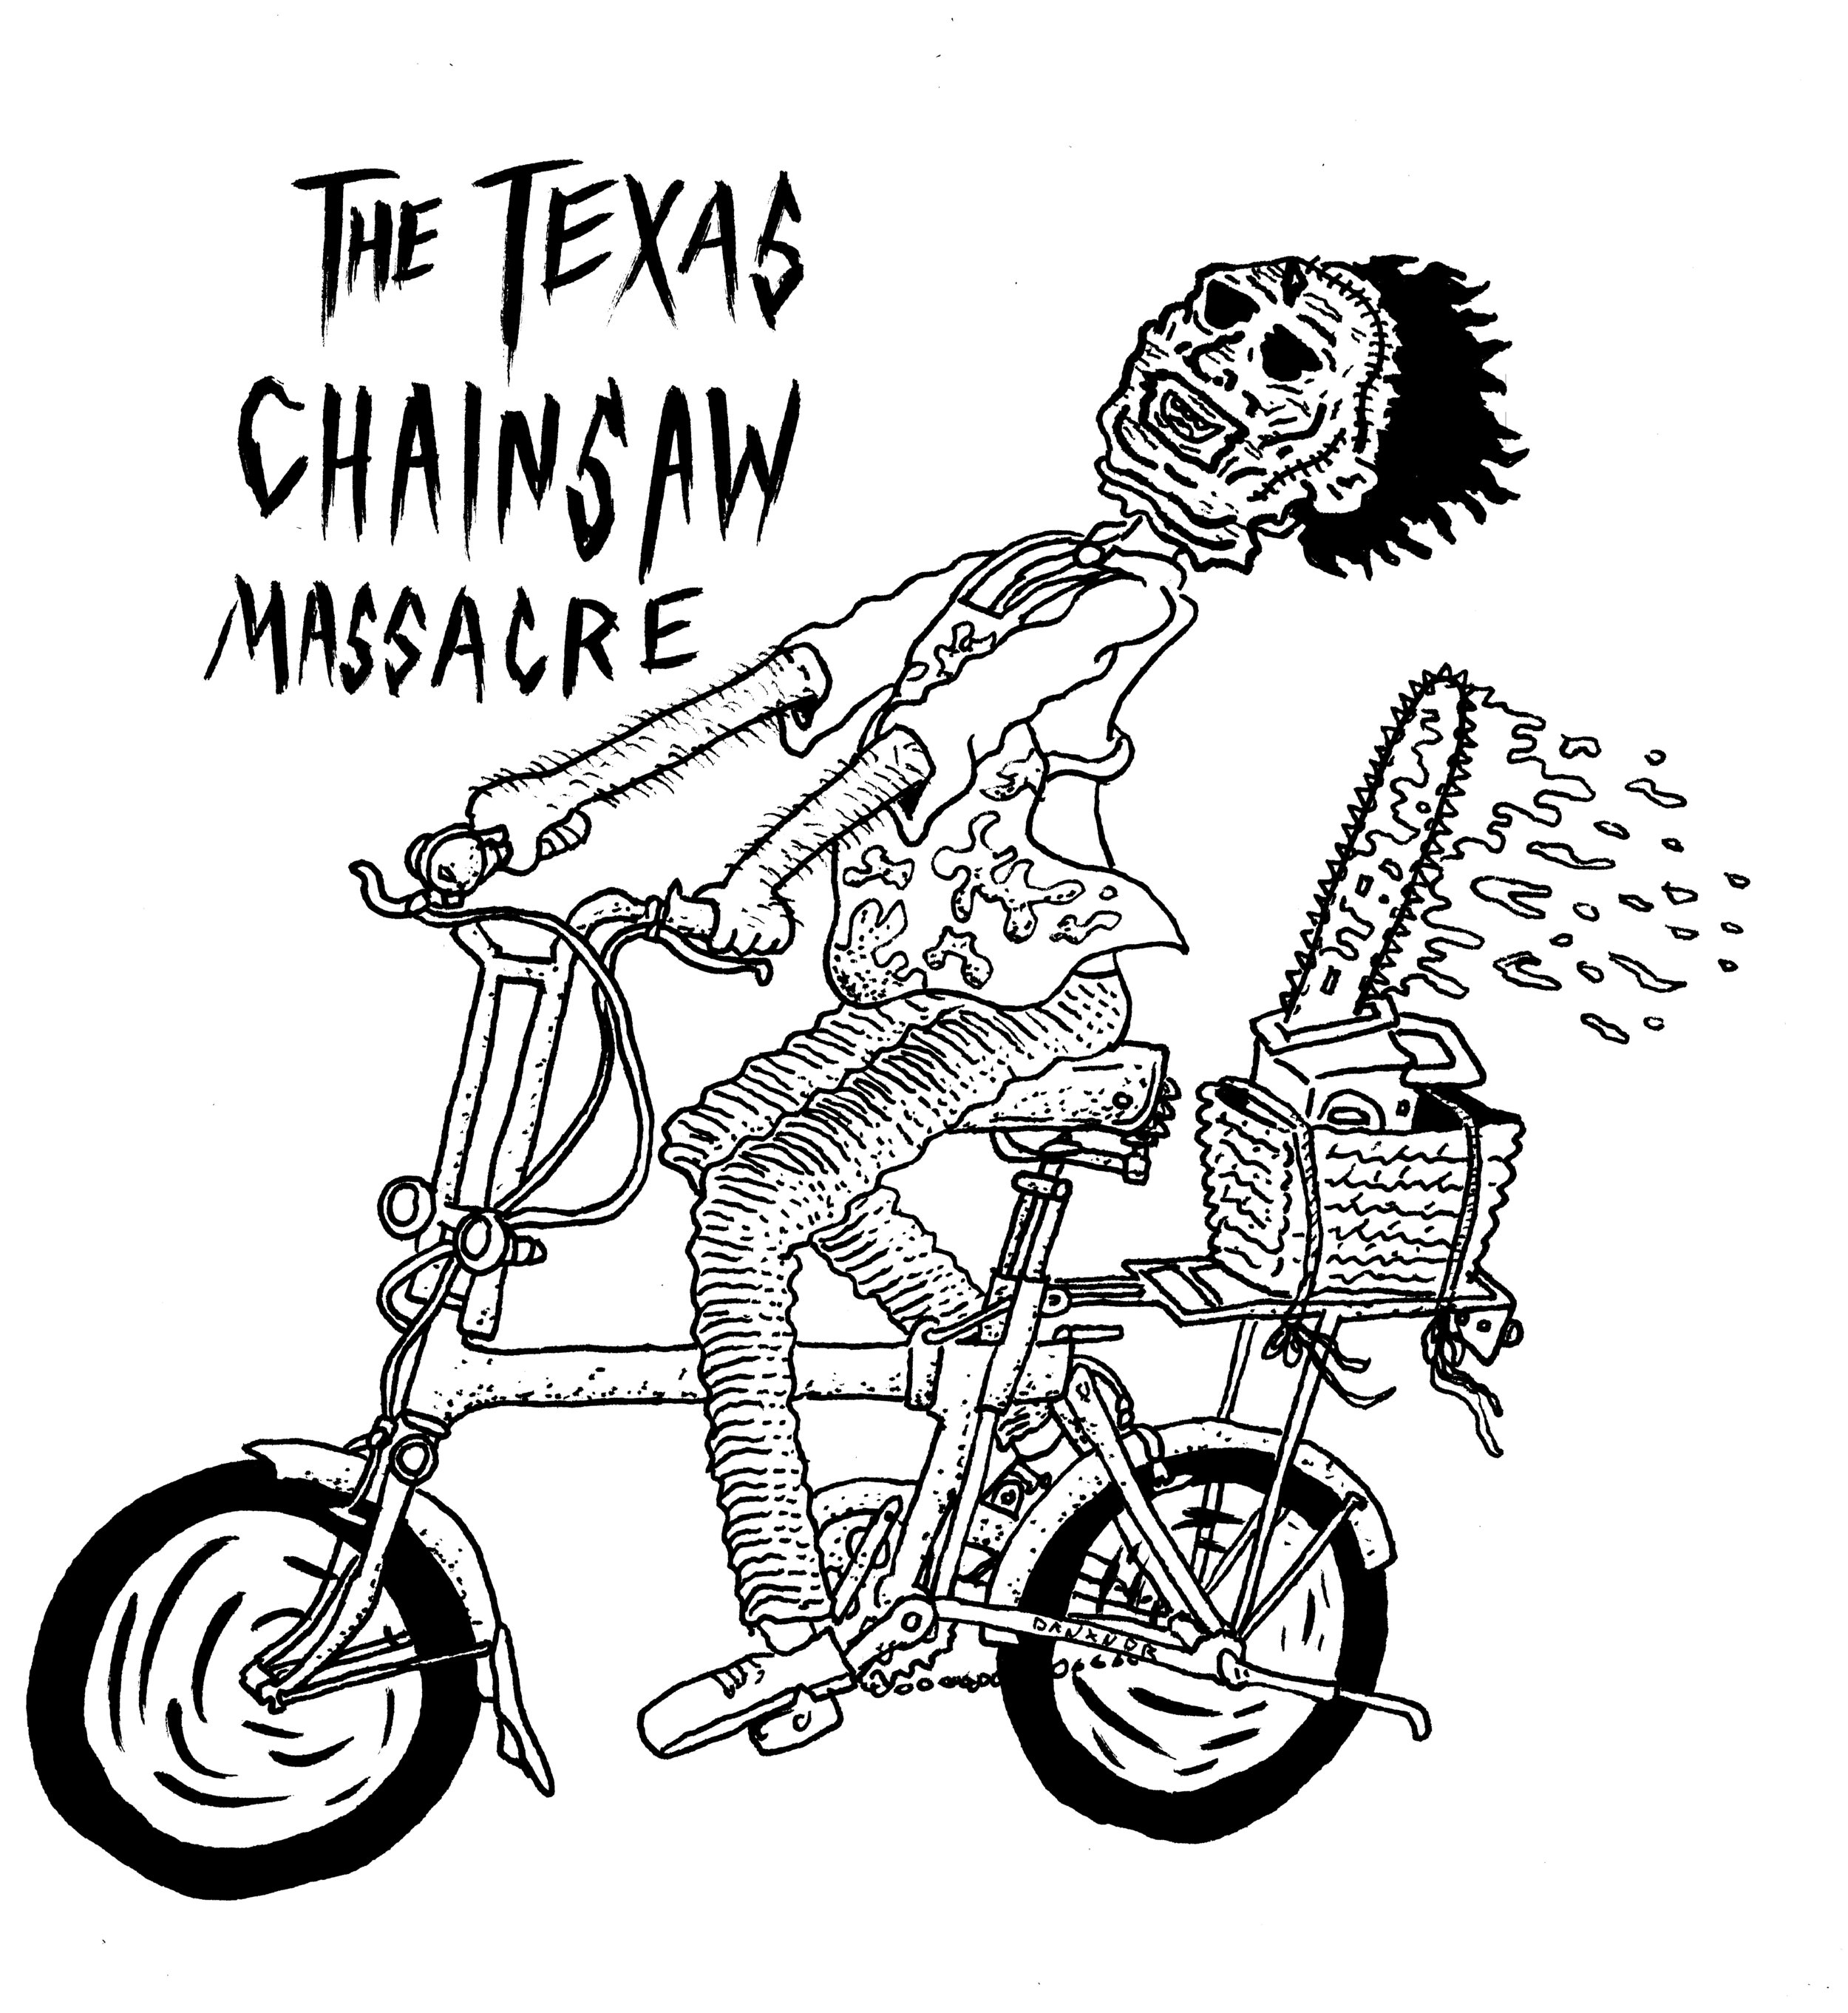 The Texas Chainsaw Massacre009.jpg